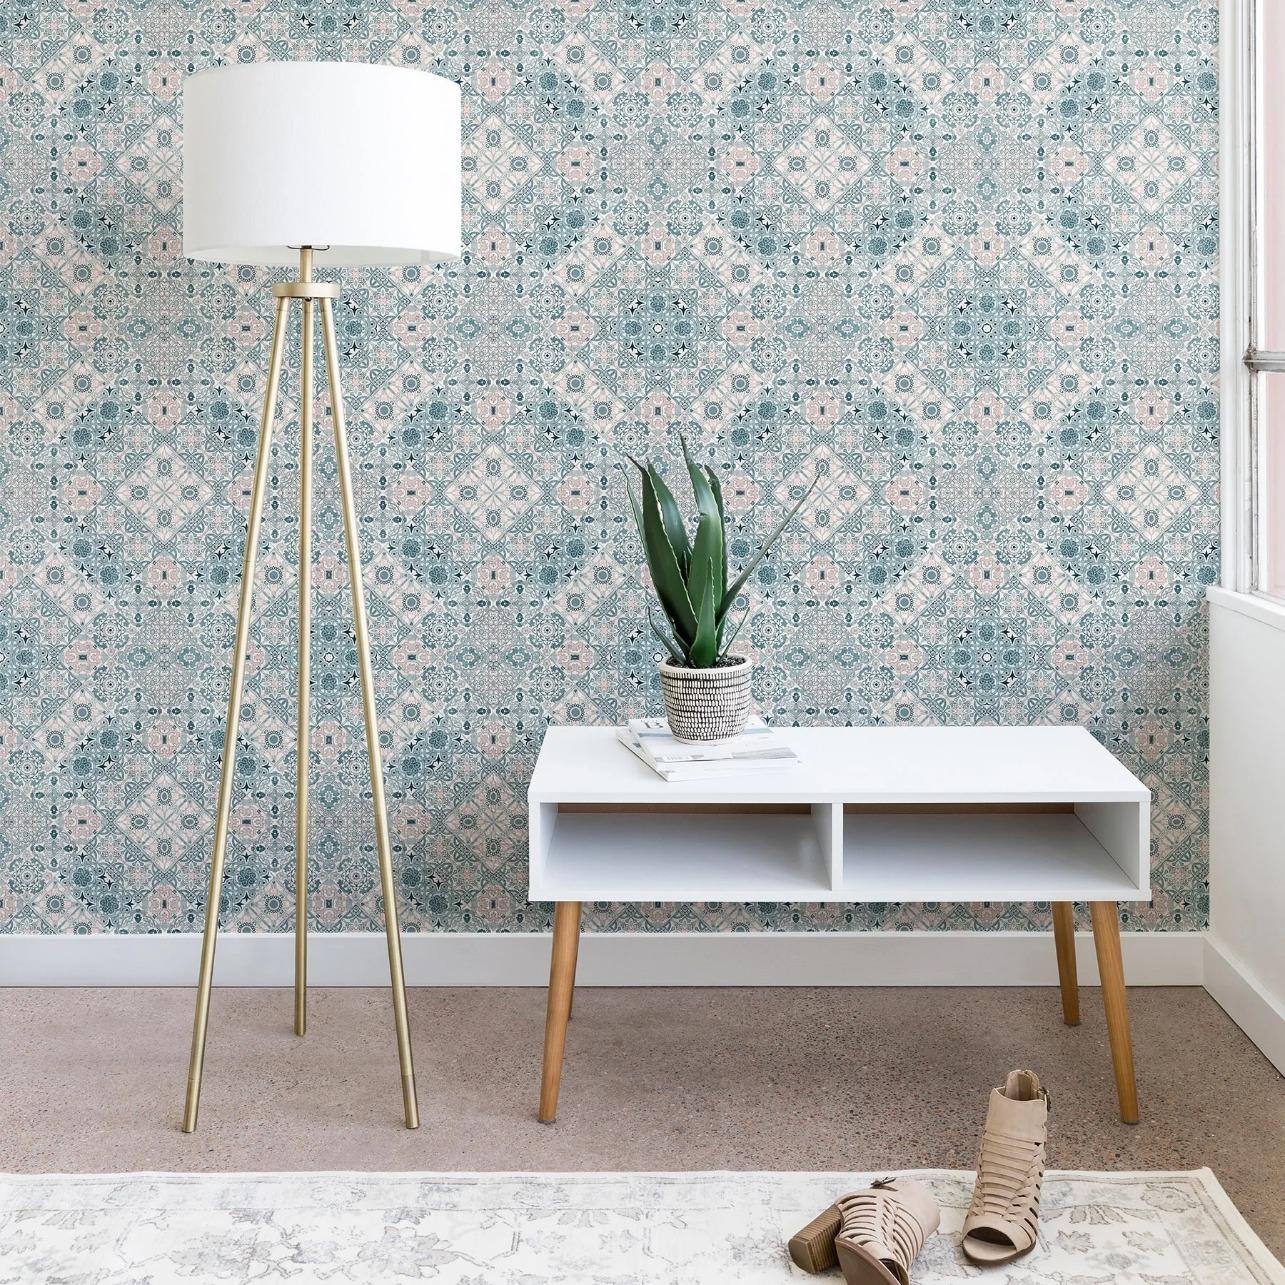 Marta Barragan Camarasa Ceramic Tile Patterns Wallpaper